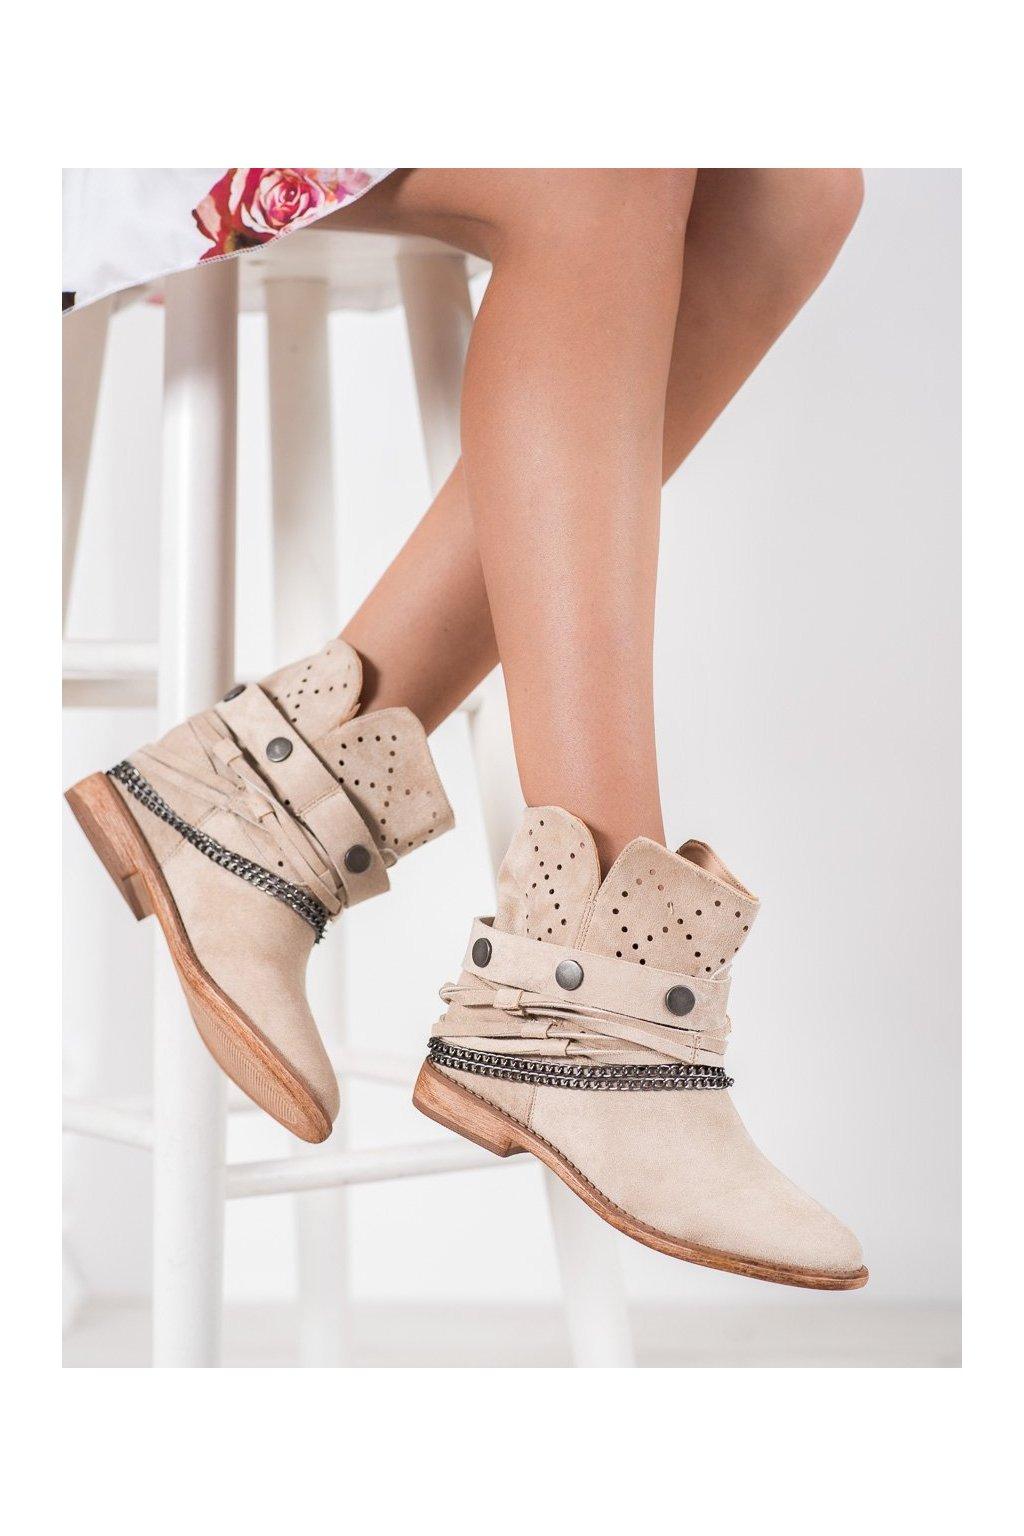 Hnedé dámske topánky Bella paris kod A3731L.KH